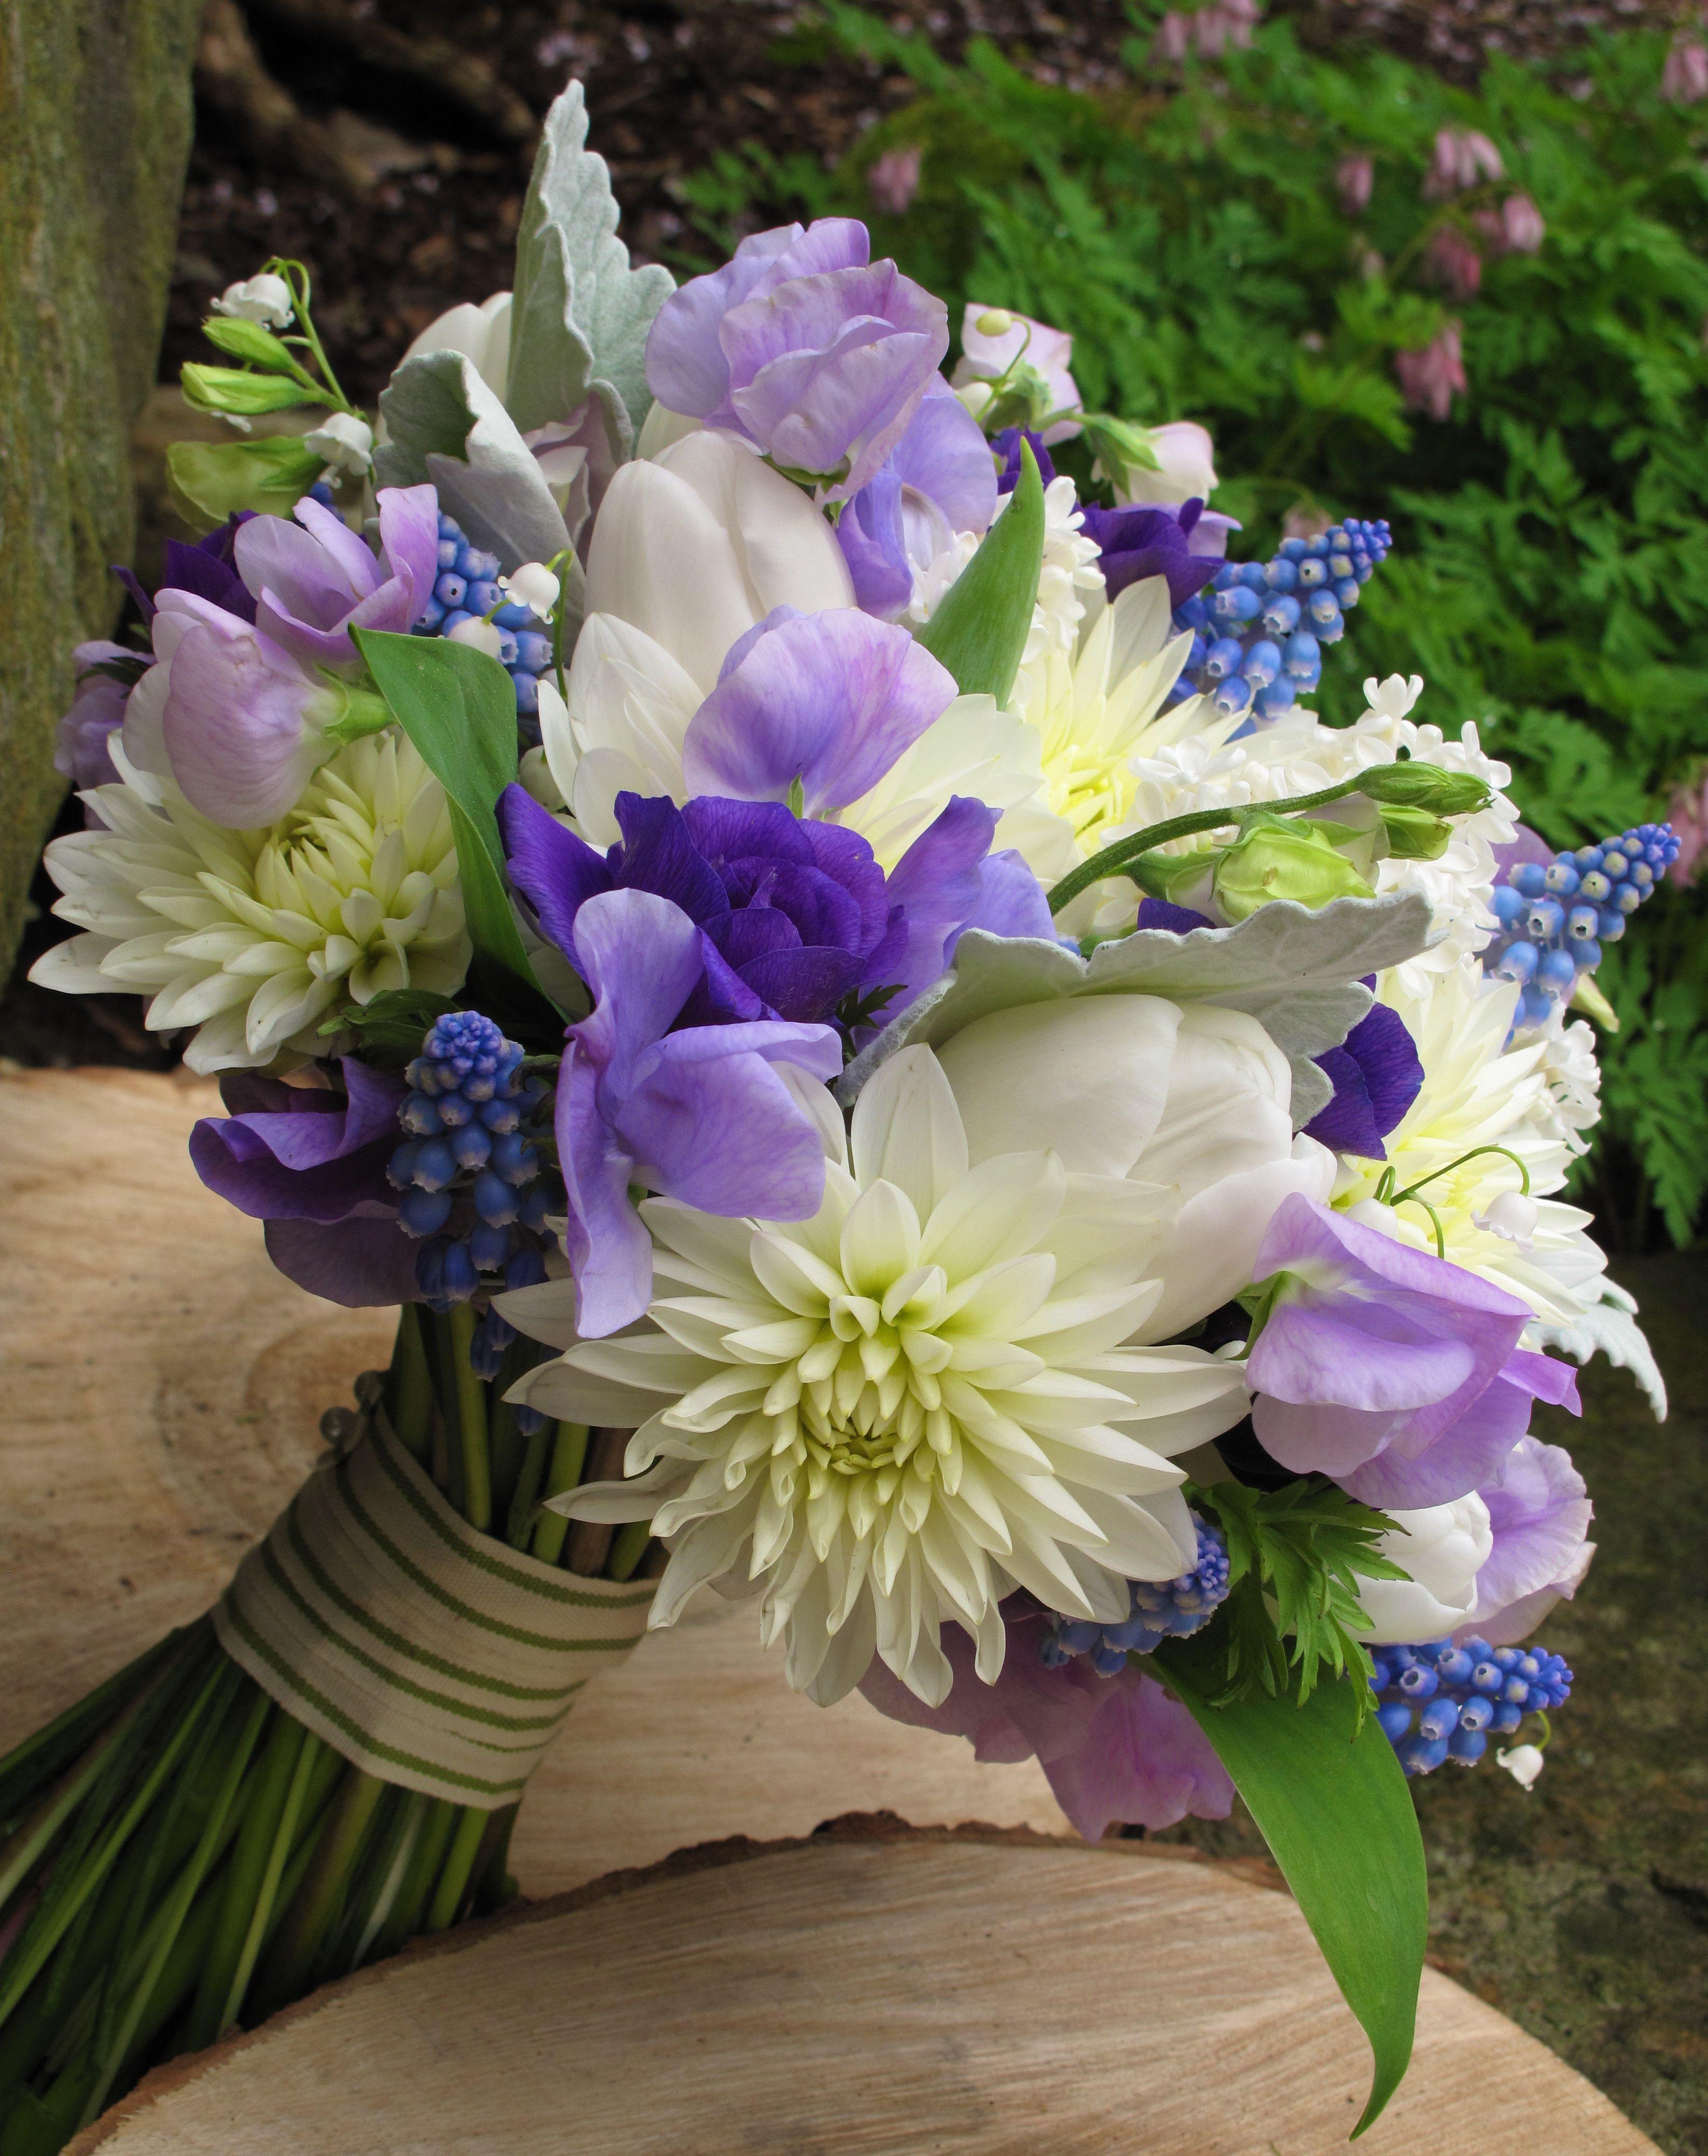 white dahlia, blue muscari, purple lisianthus, lavender